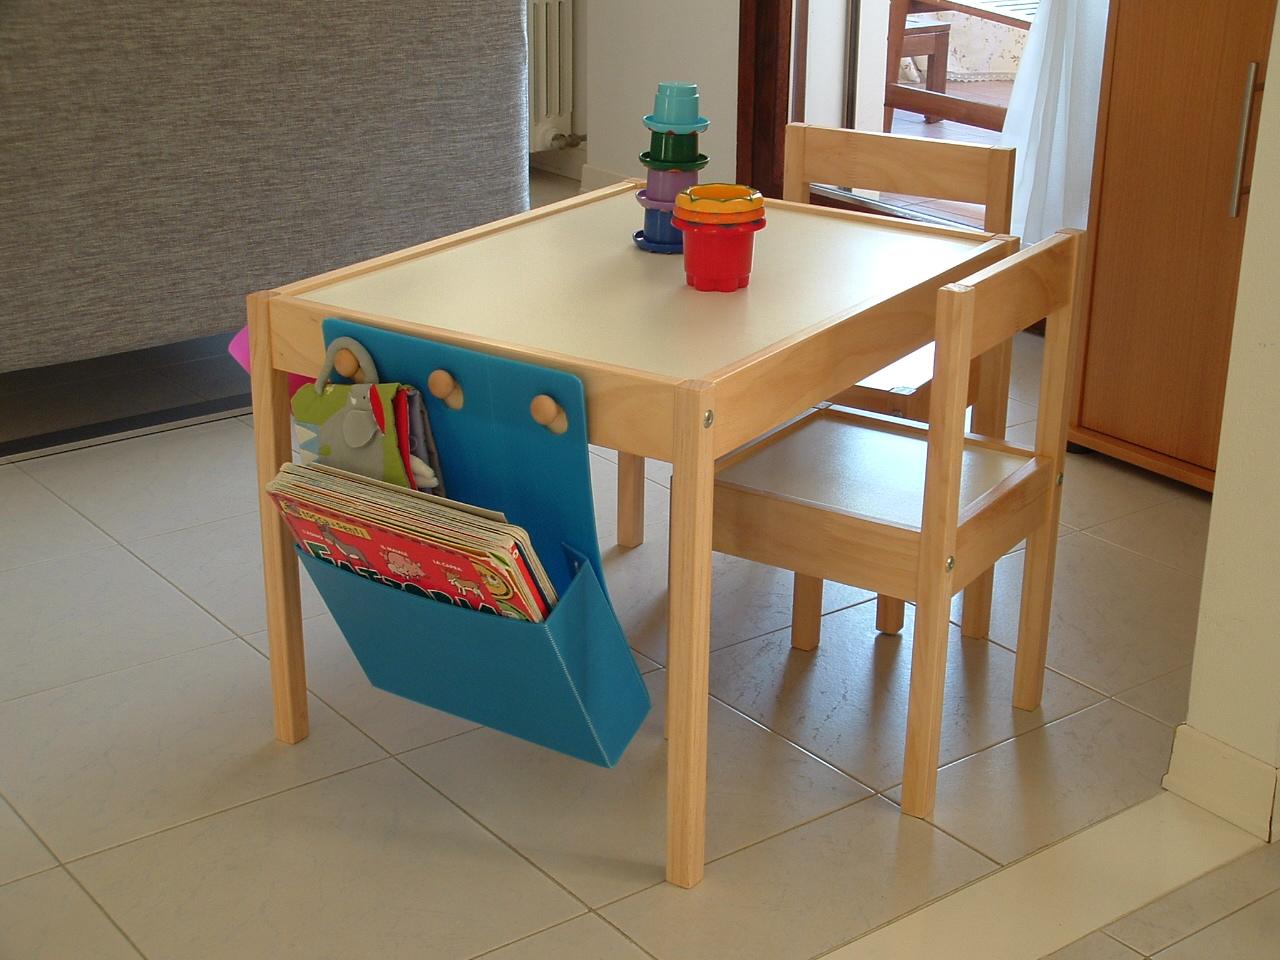 Latt table equipped - IKEA Hackers - IKEA Hackers